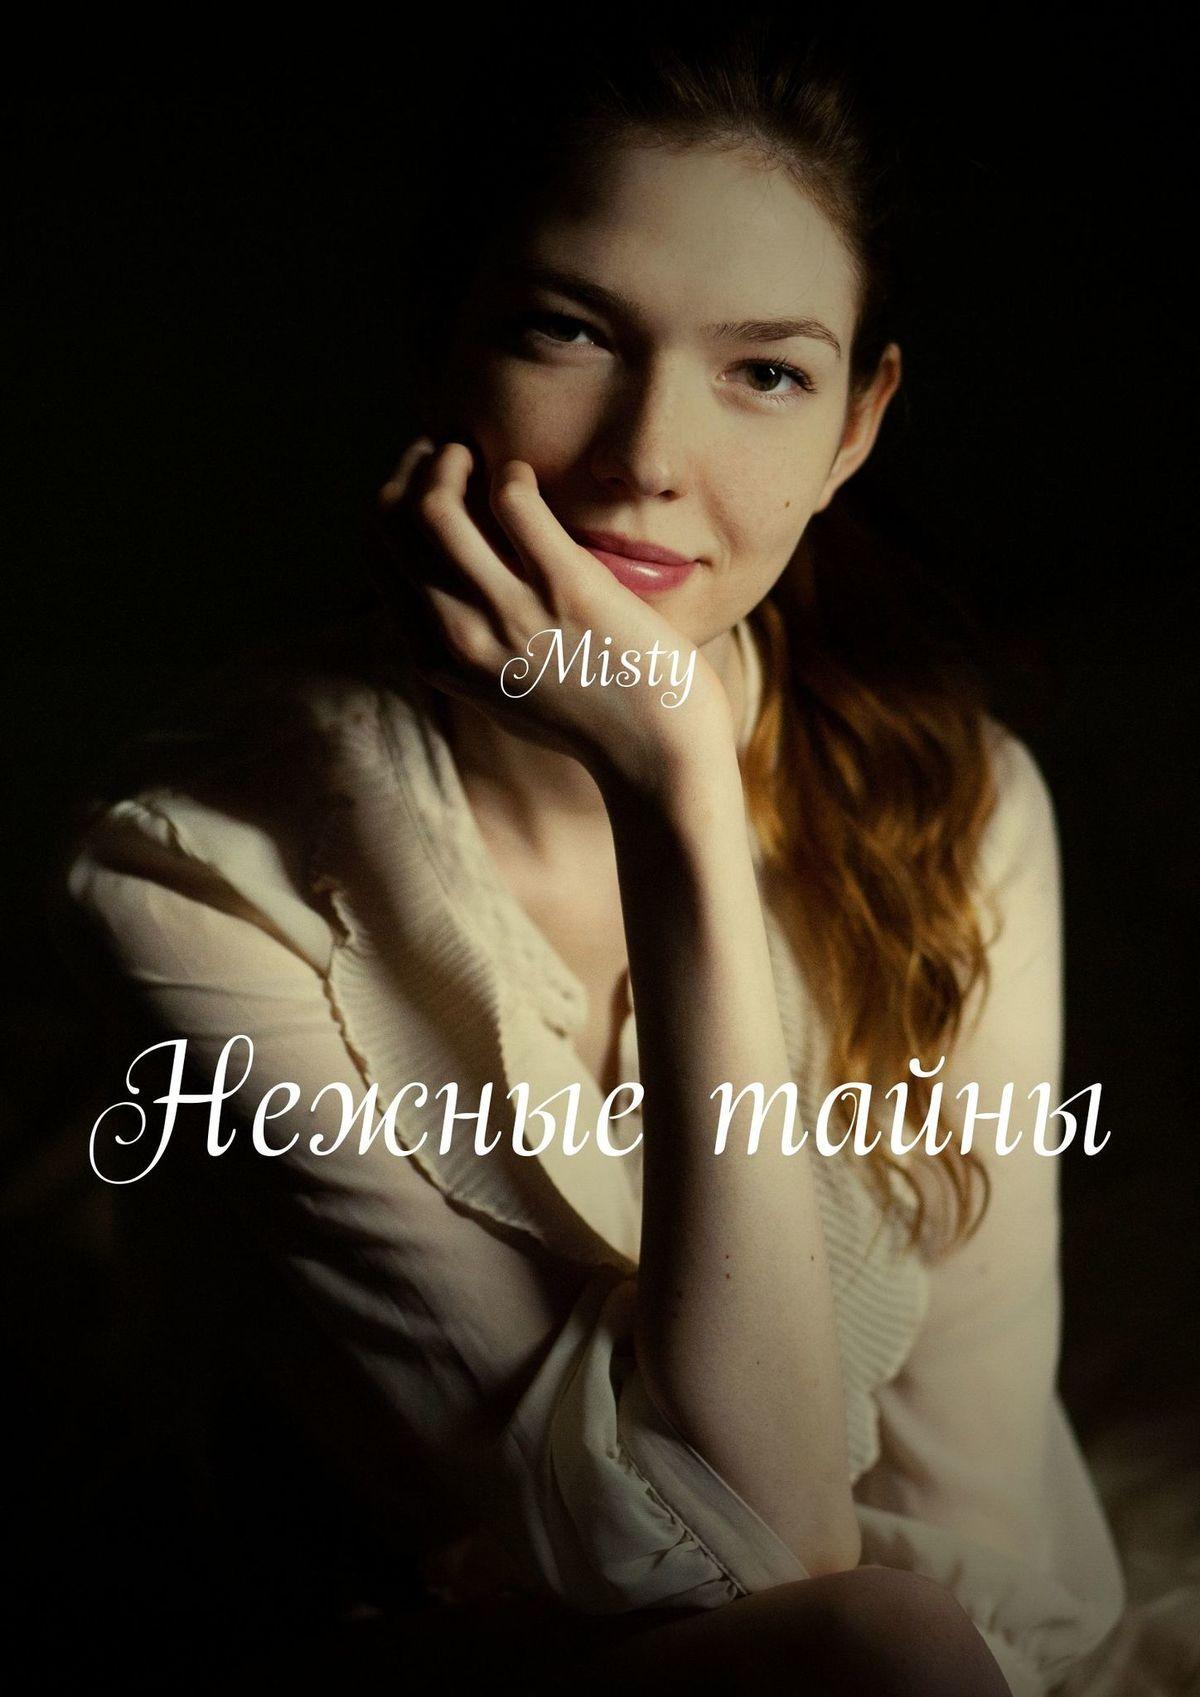 Misty Тень улыбки